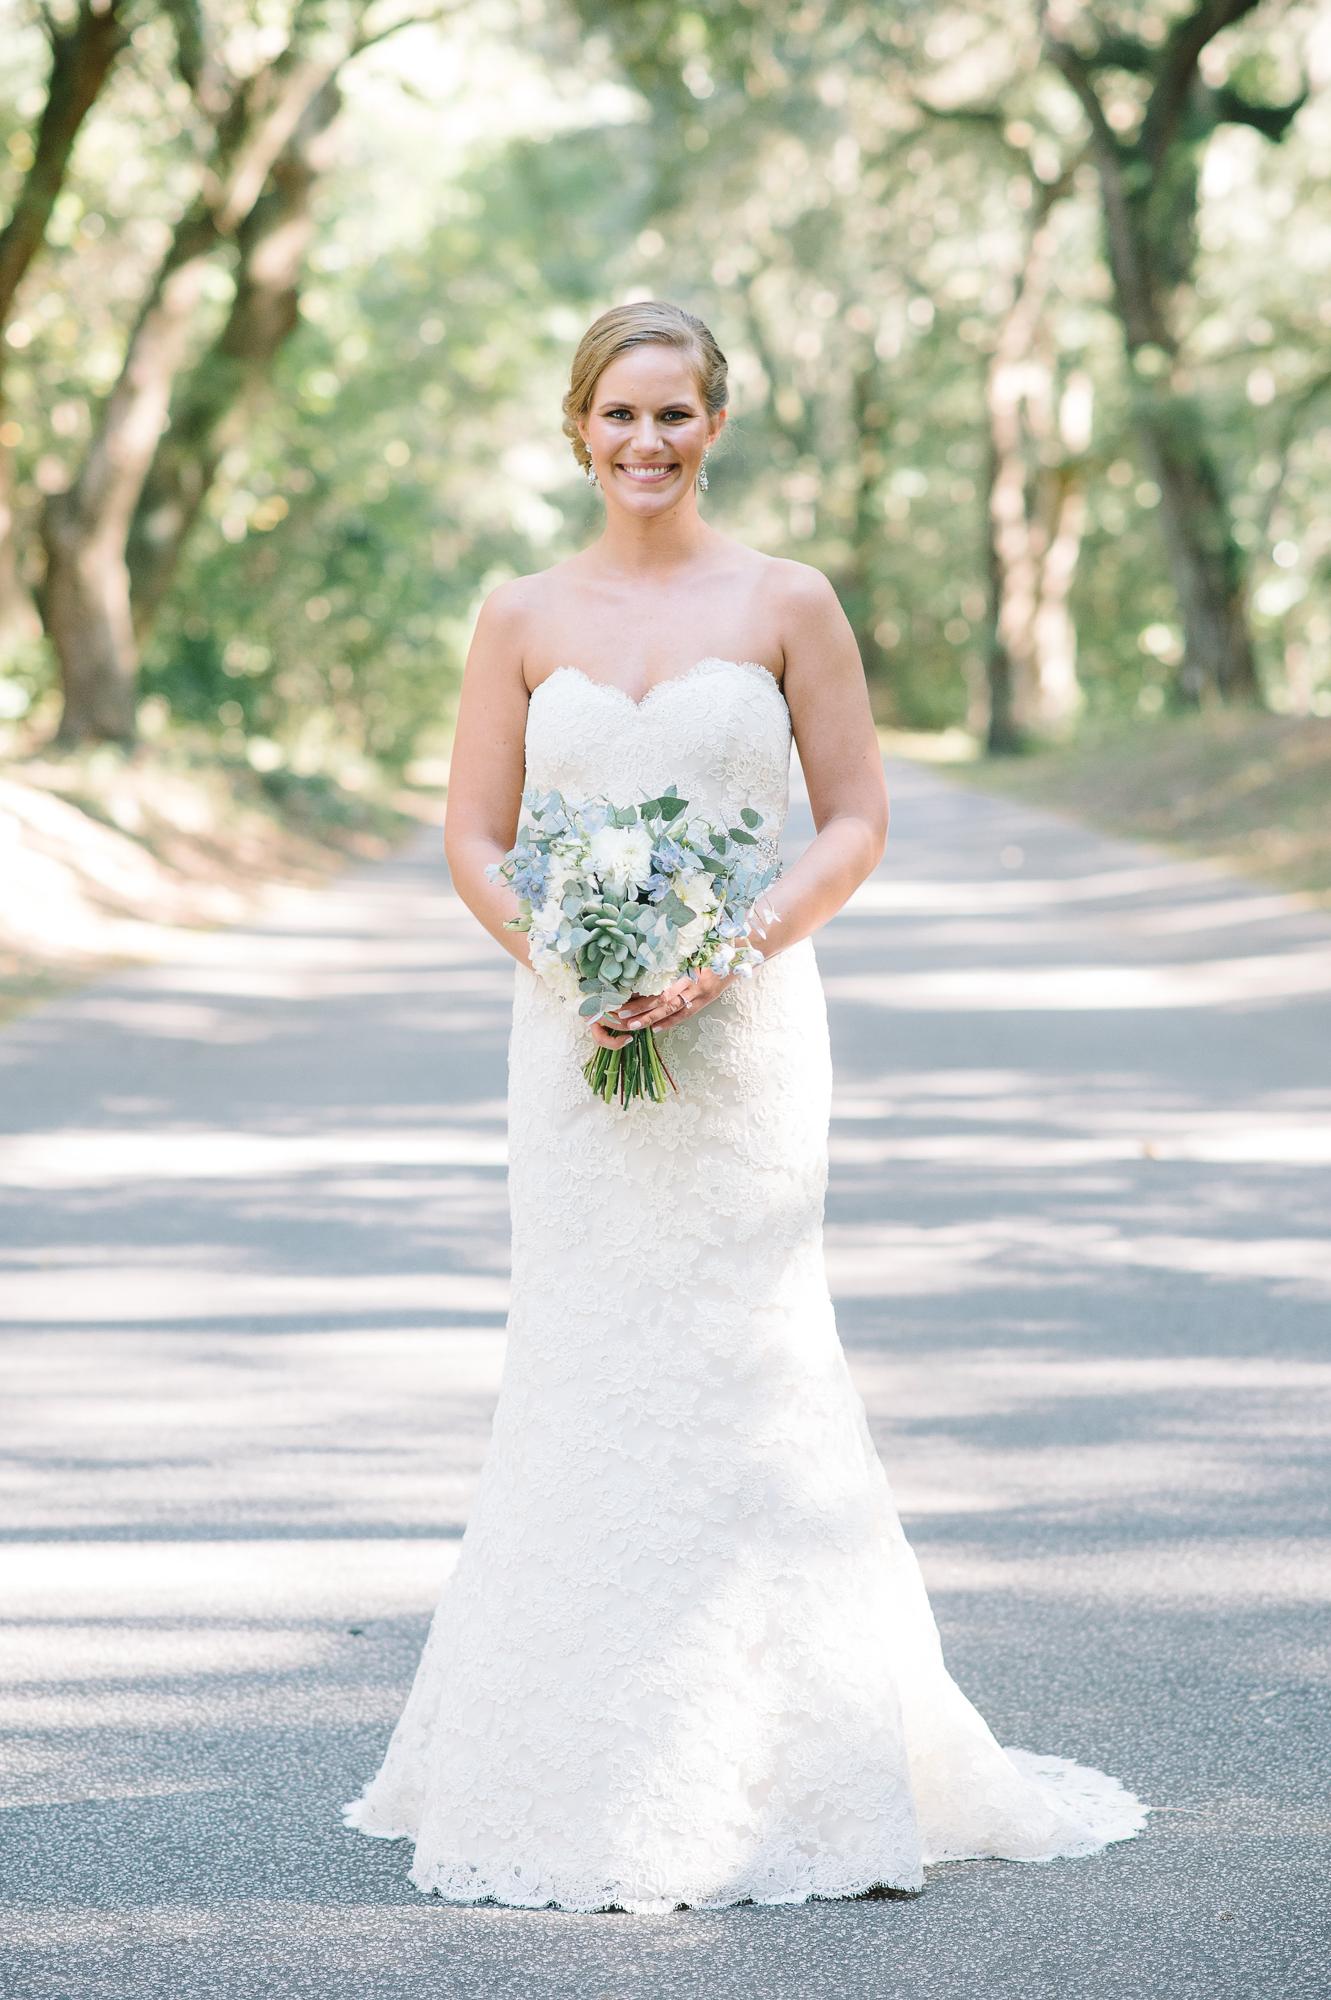 Charleston wedding at Legare Waring House